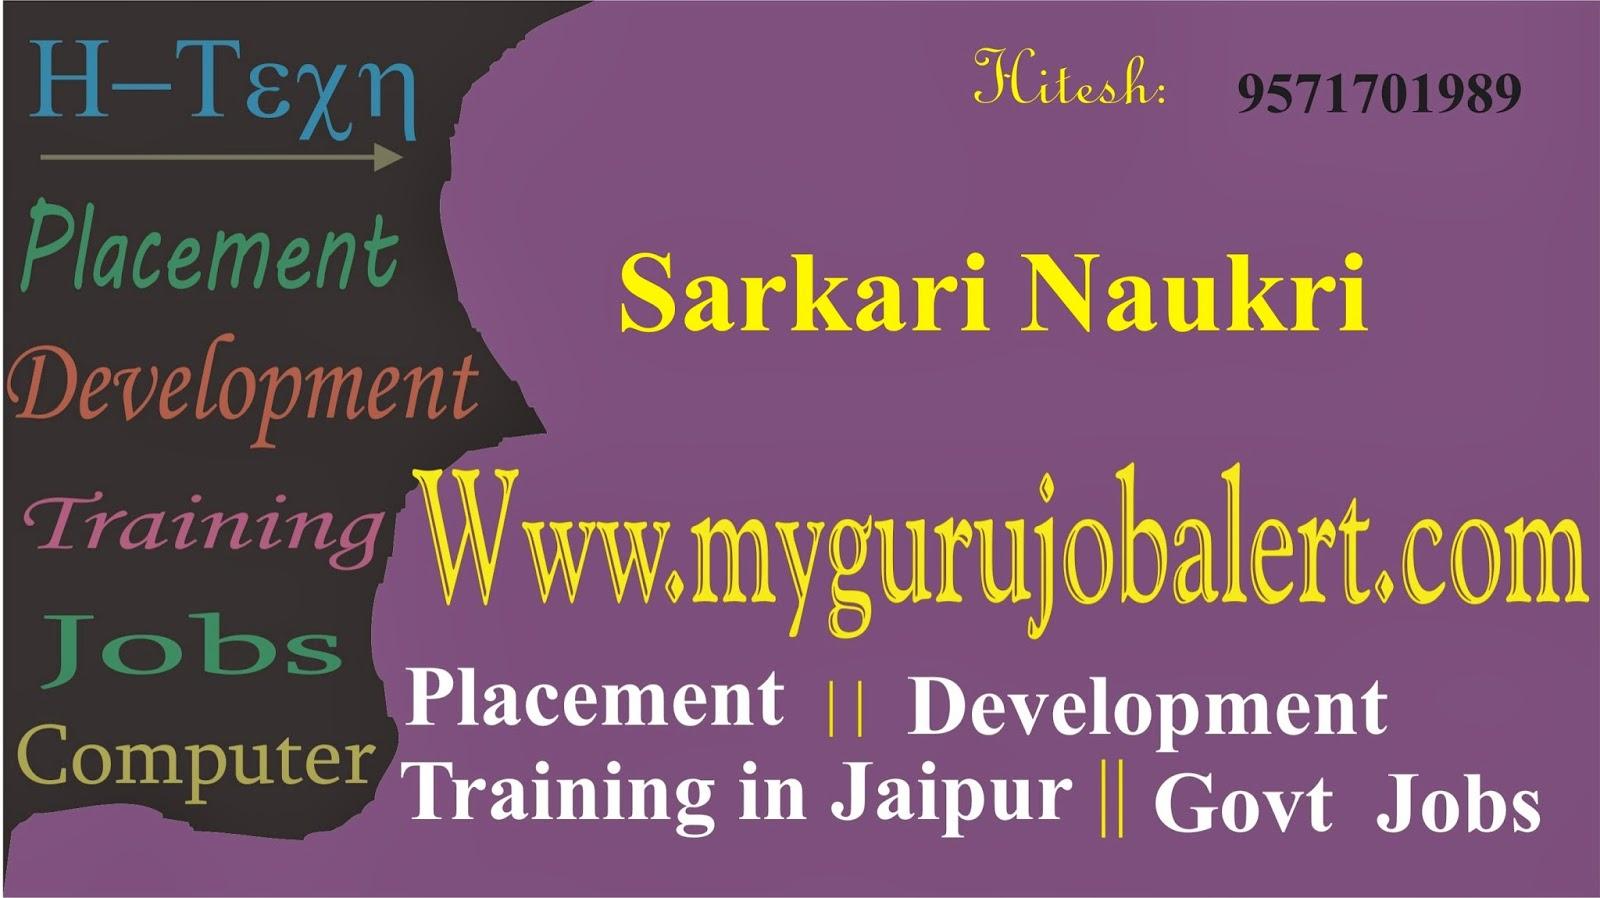 my guru job alert mygurujobalert com h tech we provides notice latest news about recruitment and we also provides govt jobs state wise jobs state jobs government